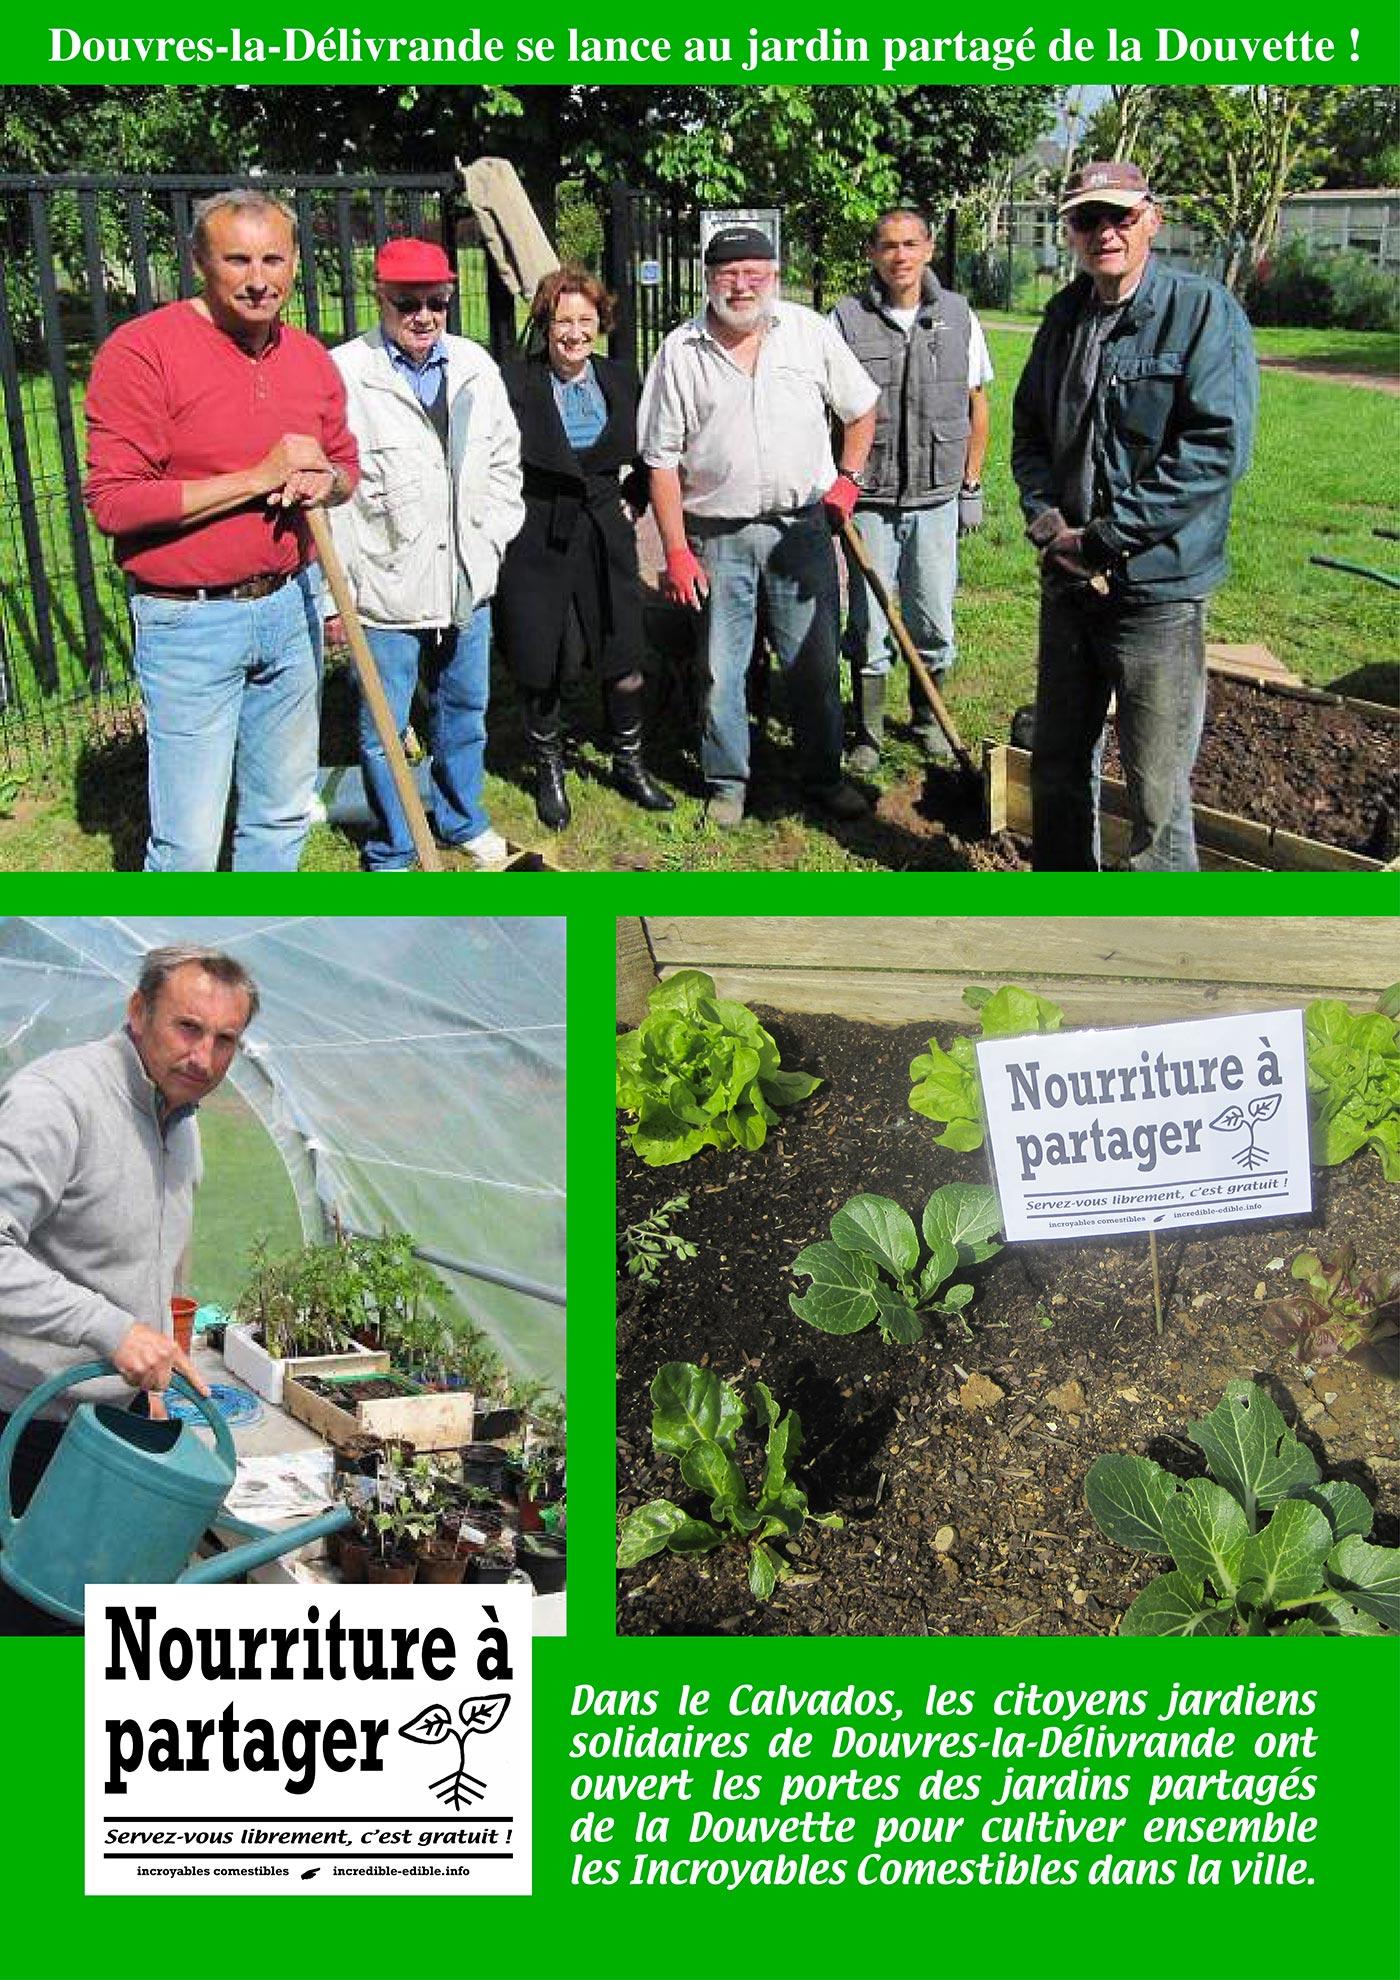 c705_incredible_edible_todmorden_france_calvados_douvres-la-delivrande_agriculture_urbaine_incroyables_comestibles_w1400